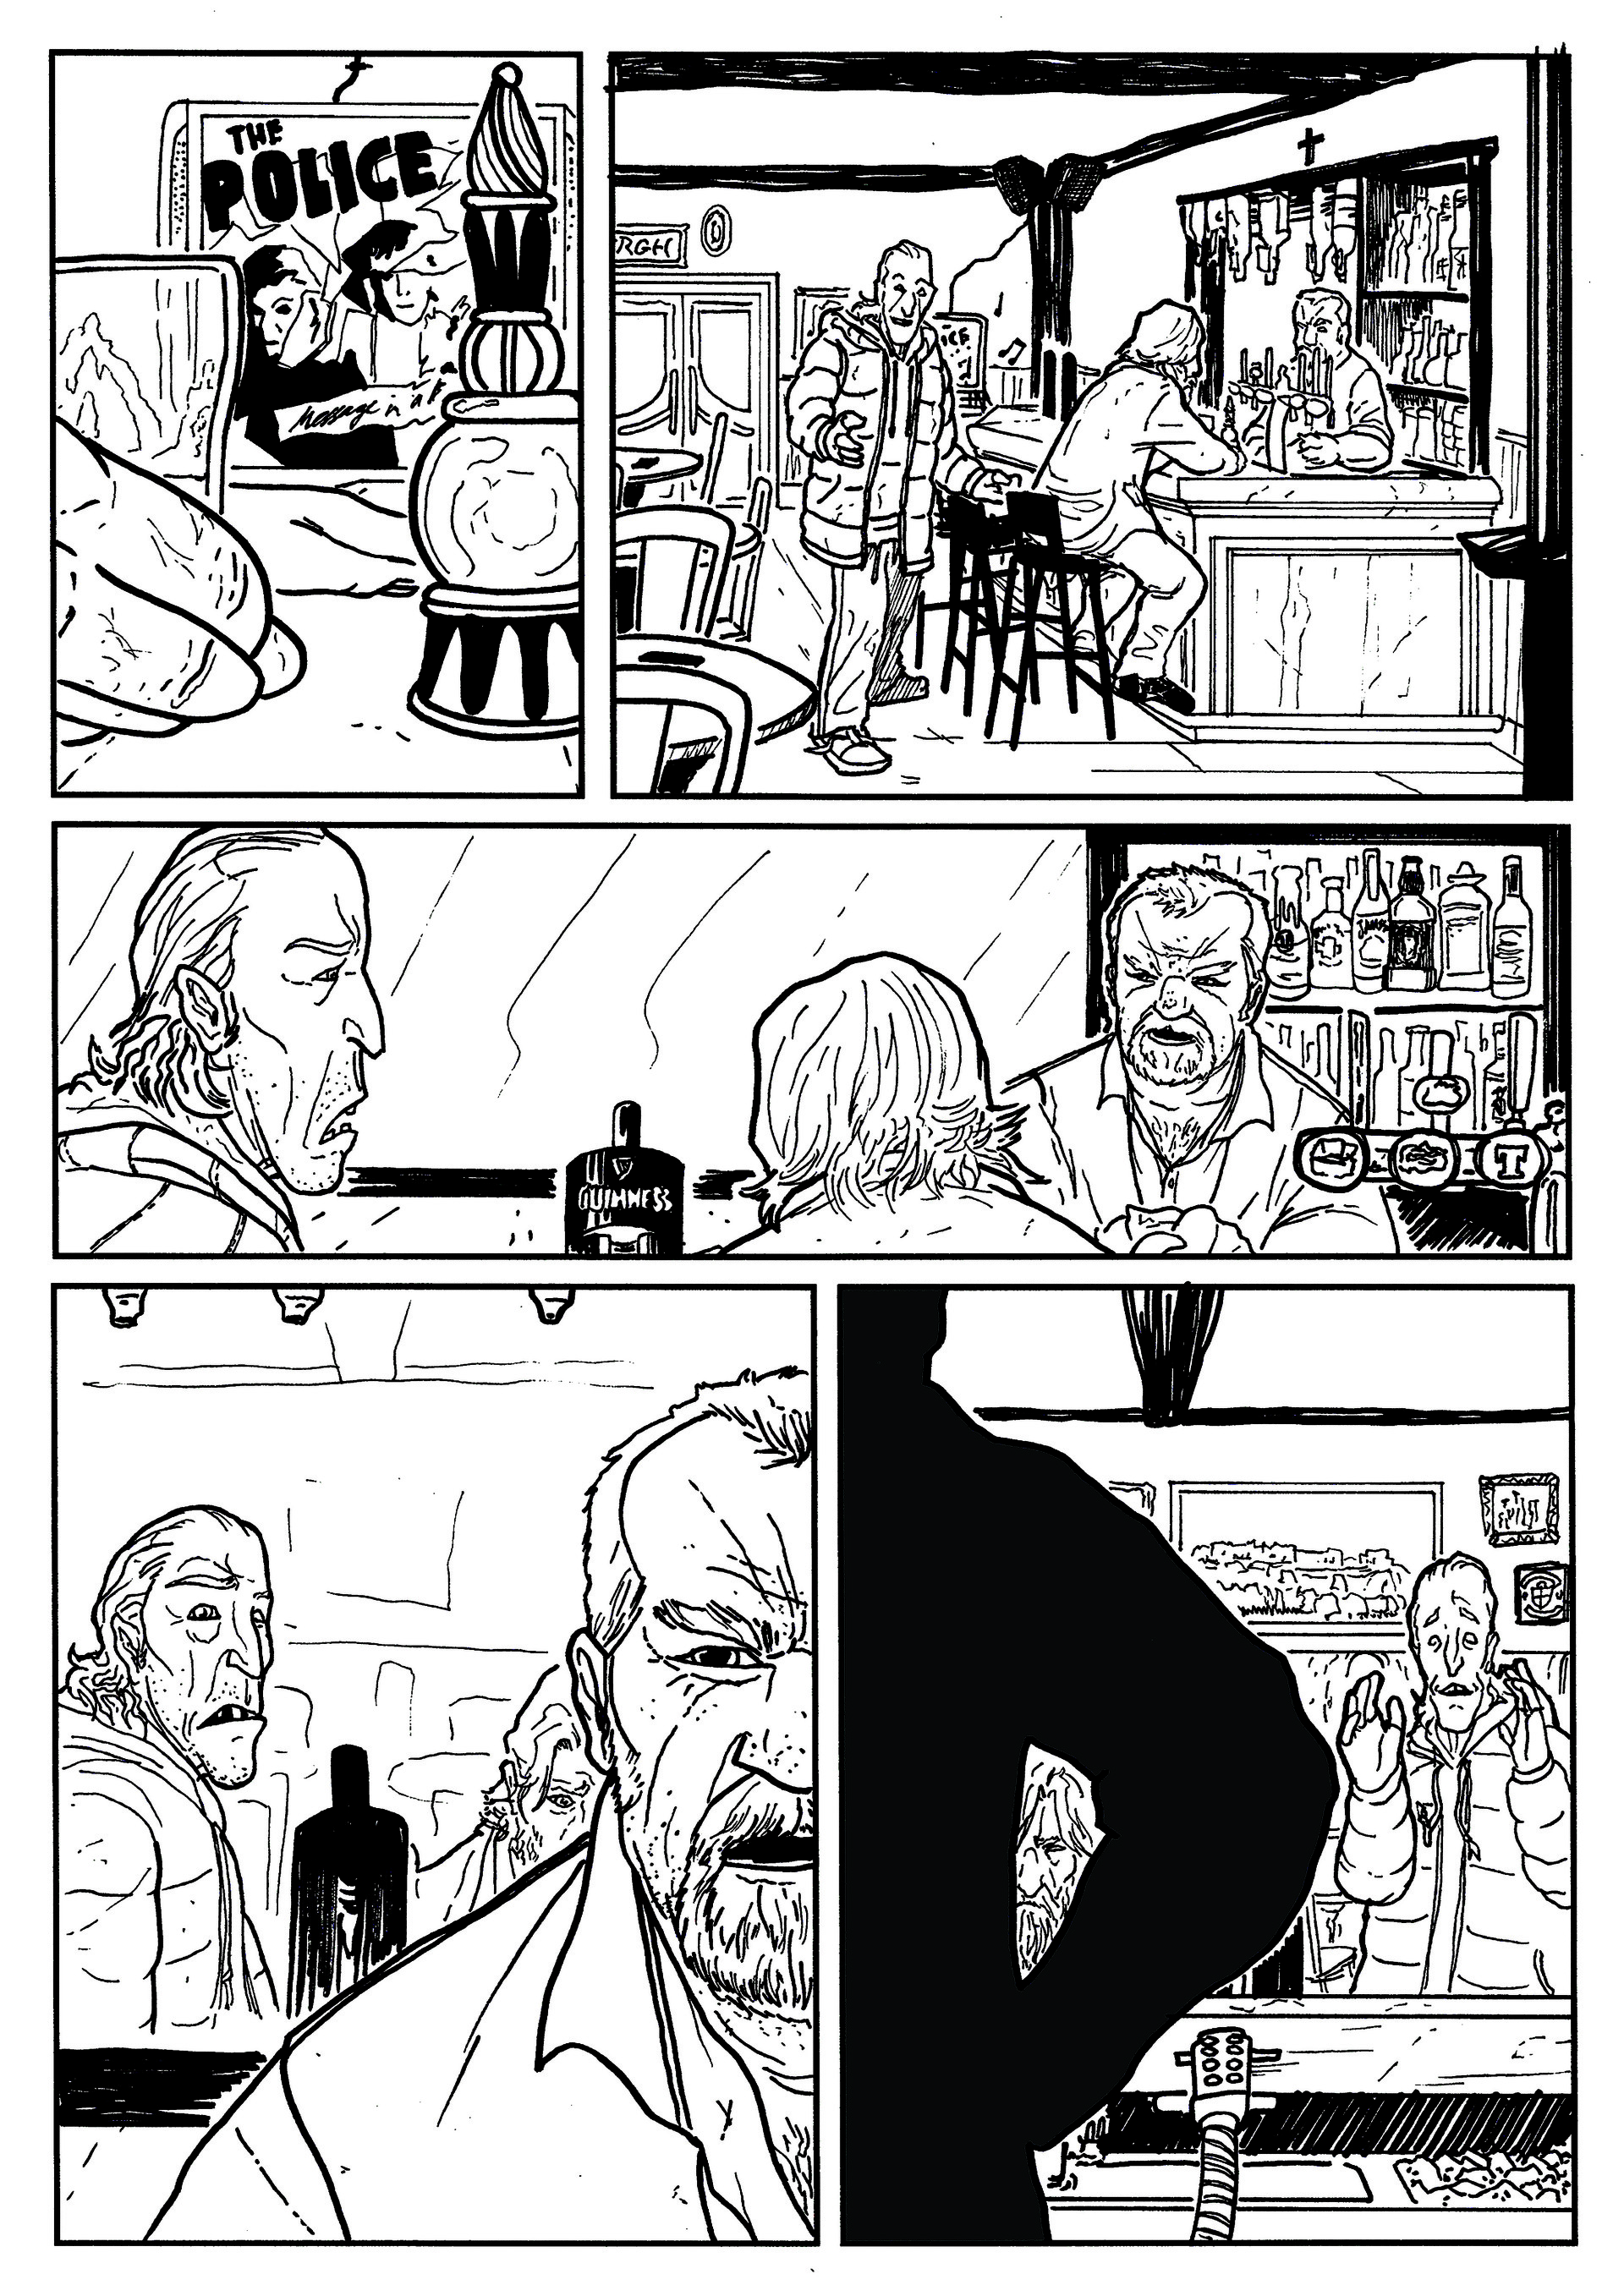 Elliot balson u page3 inks